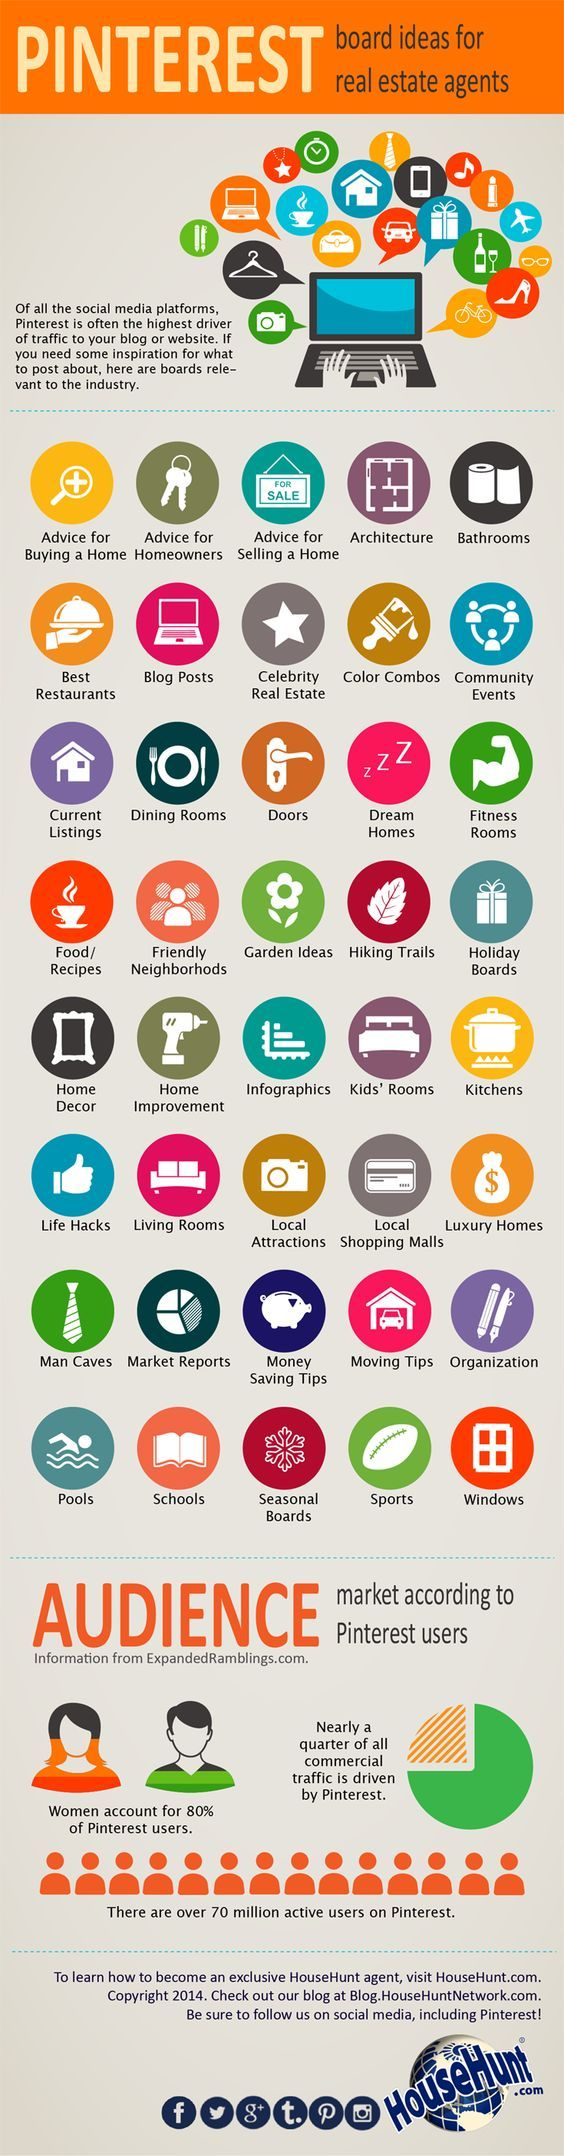 Pinterest Board Ideas for Real Estate Agents: http://www.blog.househuntnetwork.com/pinterest-board-ideas-real-estate-agents/: